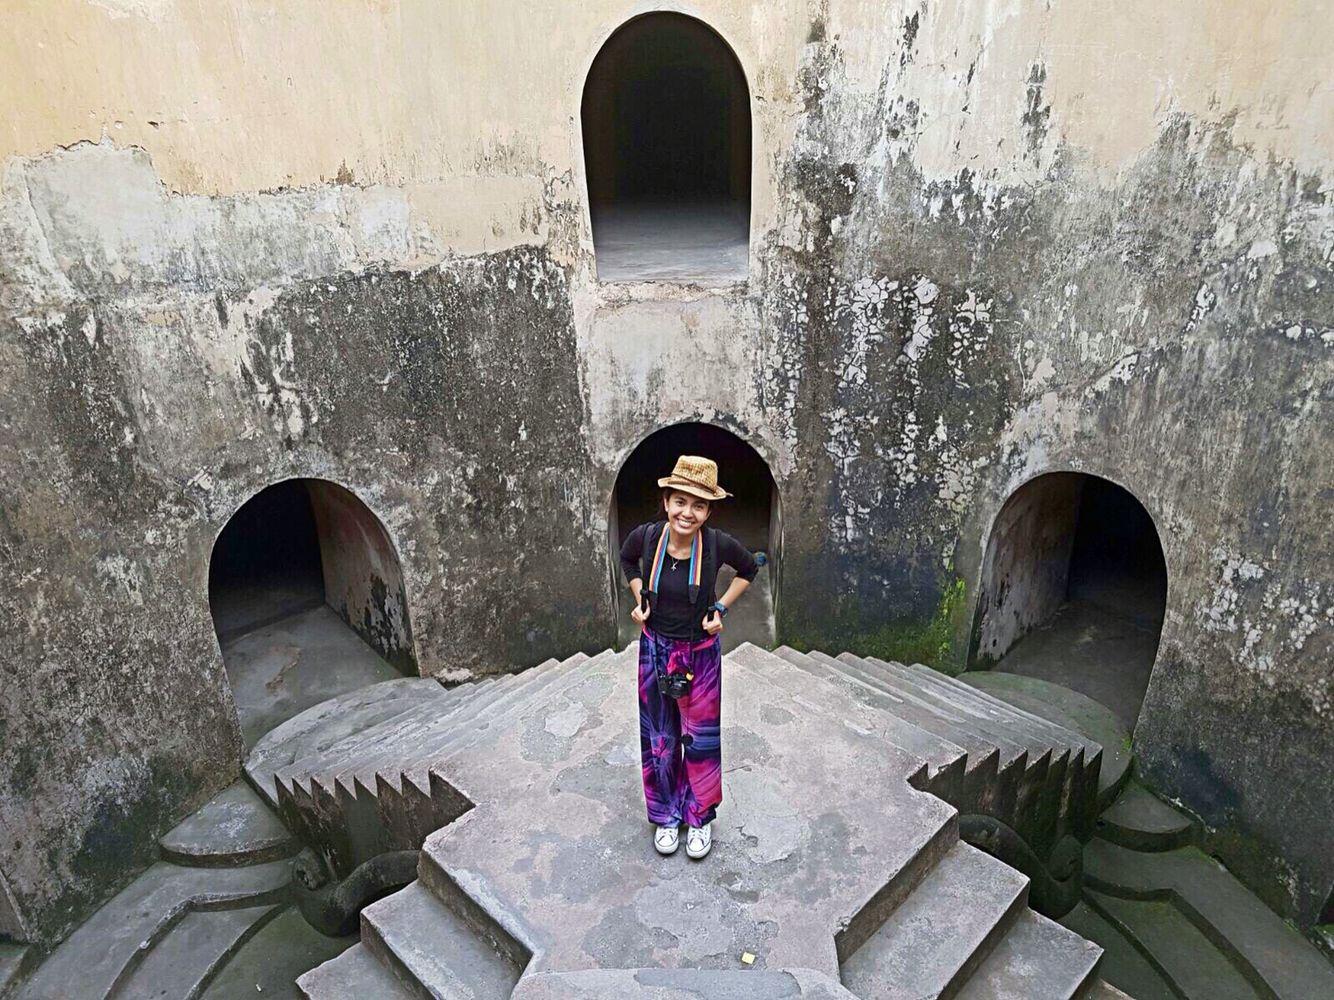 July 2016: Taman Sari Water Castle in Yogyakarta, Indonesia